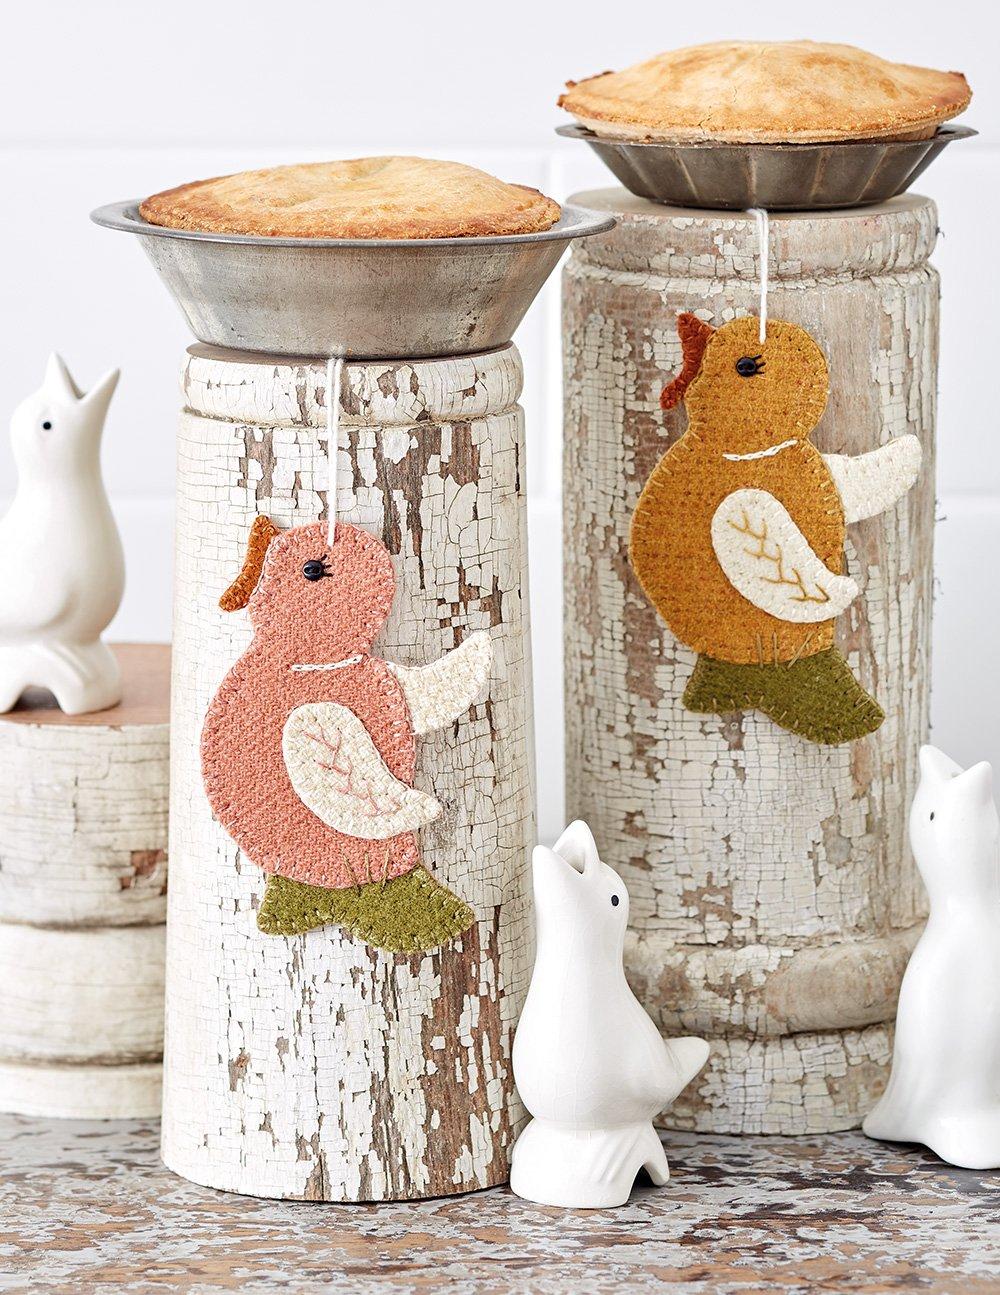 Buttermilk Basin's Vintage Vibe * Pie Bird Party Ornaments Kit